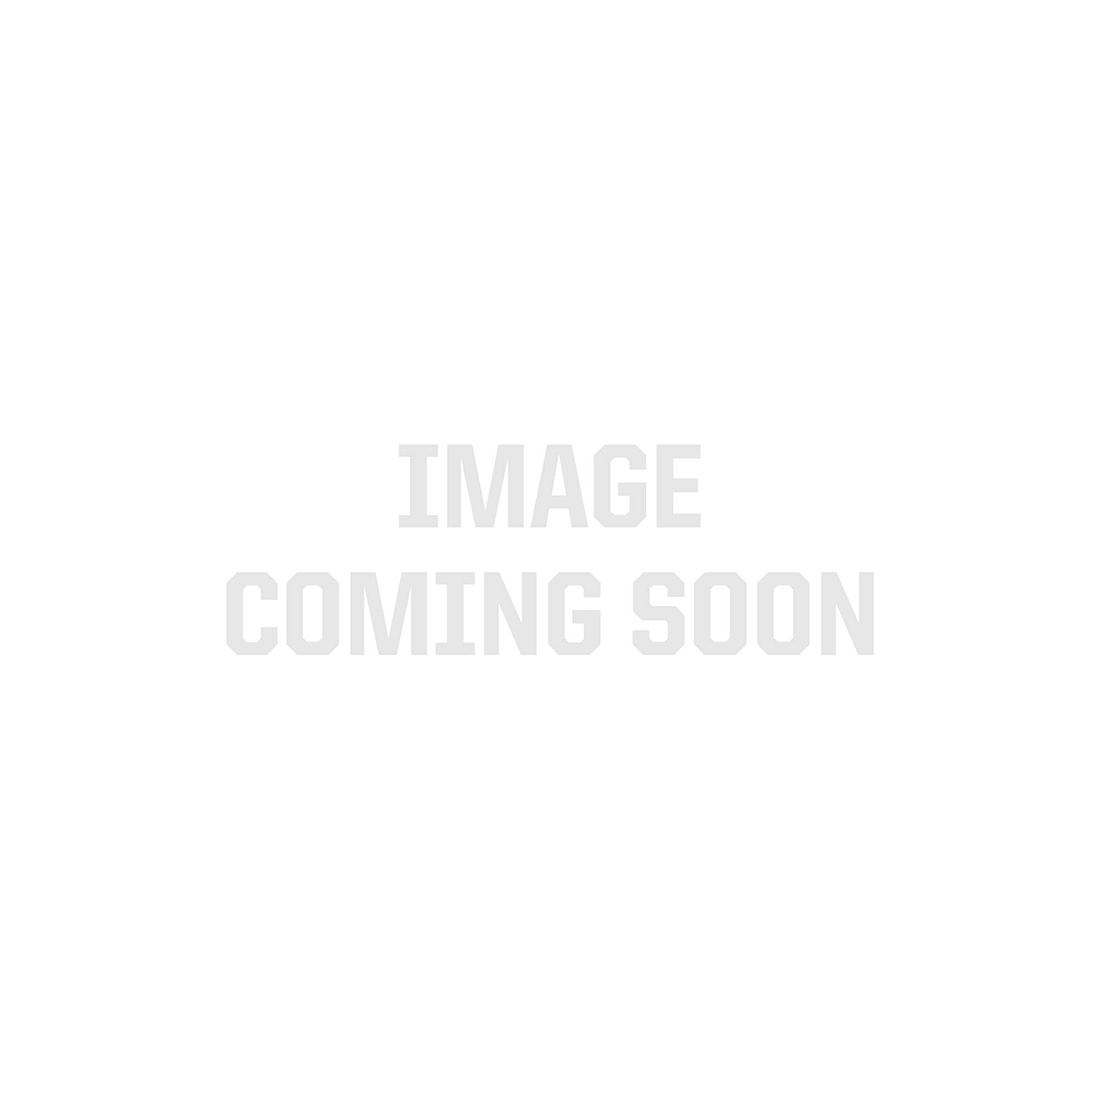 Warm White 5050 Single Row CurrentControl LED Strip Light, 60/m, 12mm wide, Sample Kit